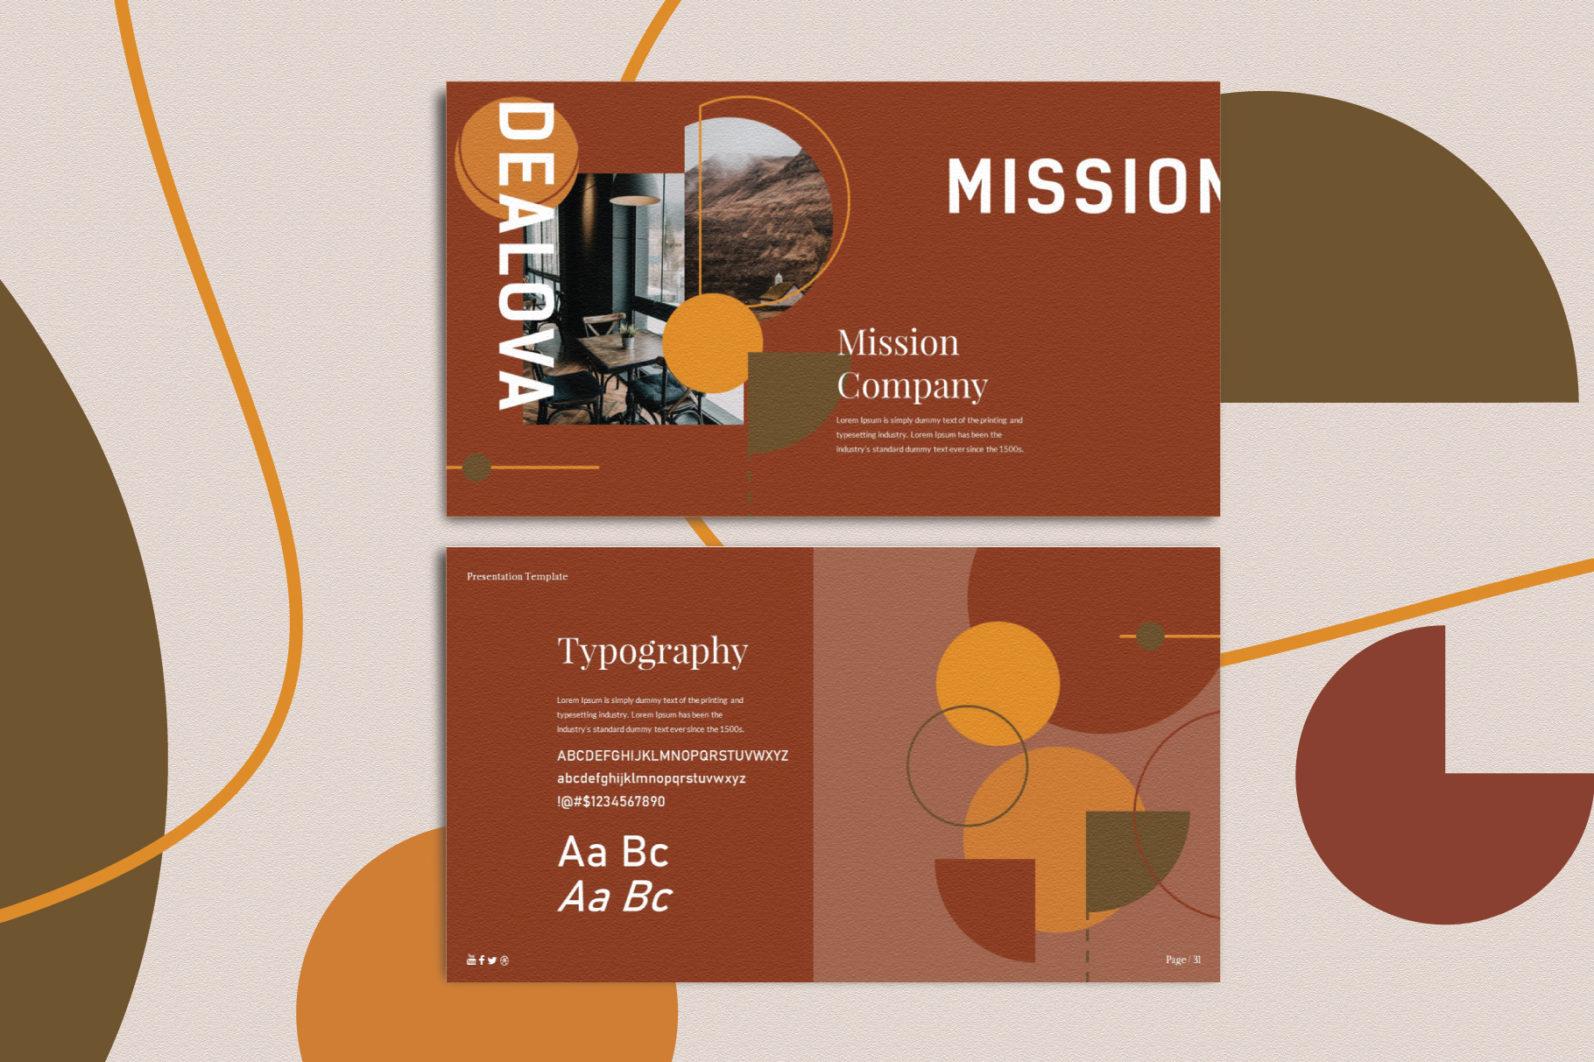 Dealova Keynote Template - PW 01d -